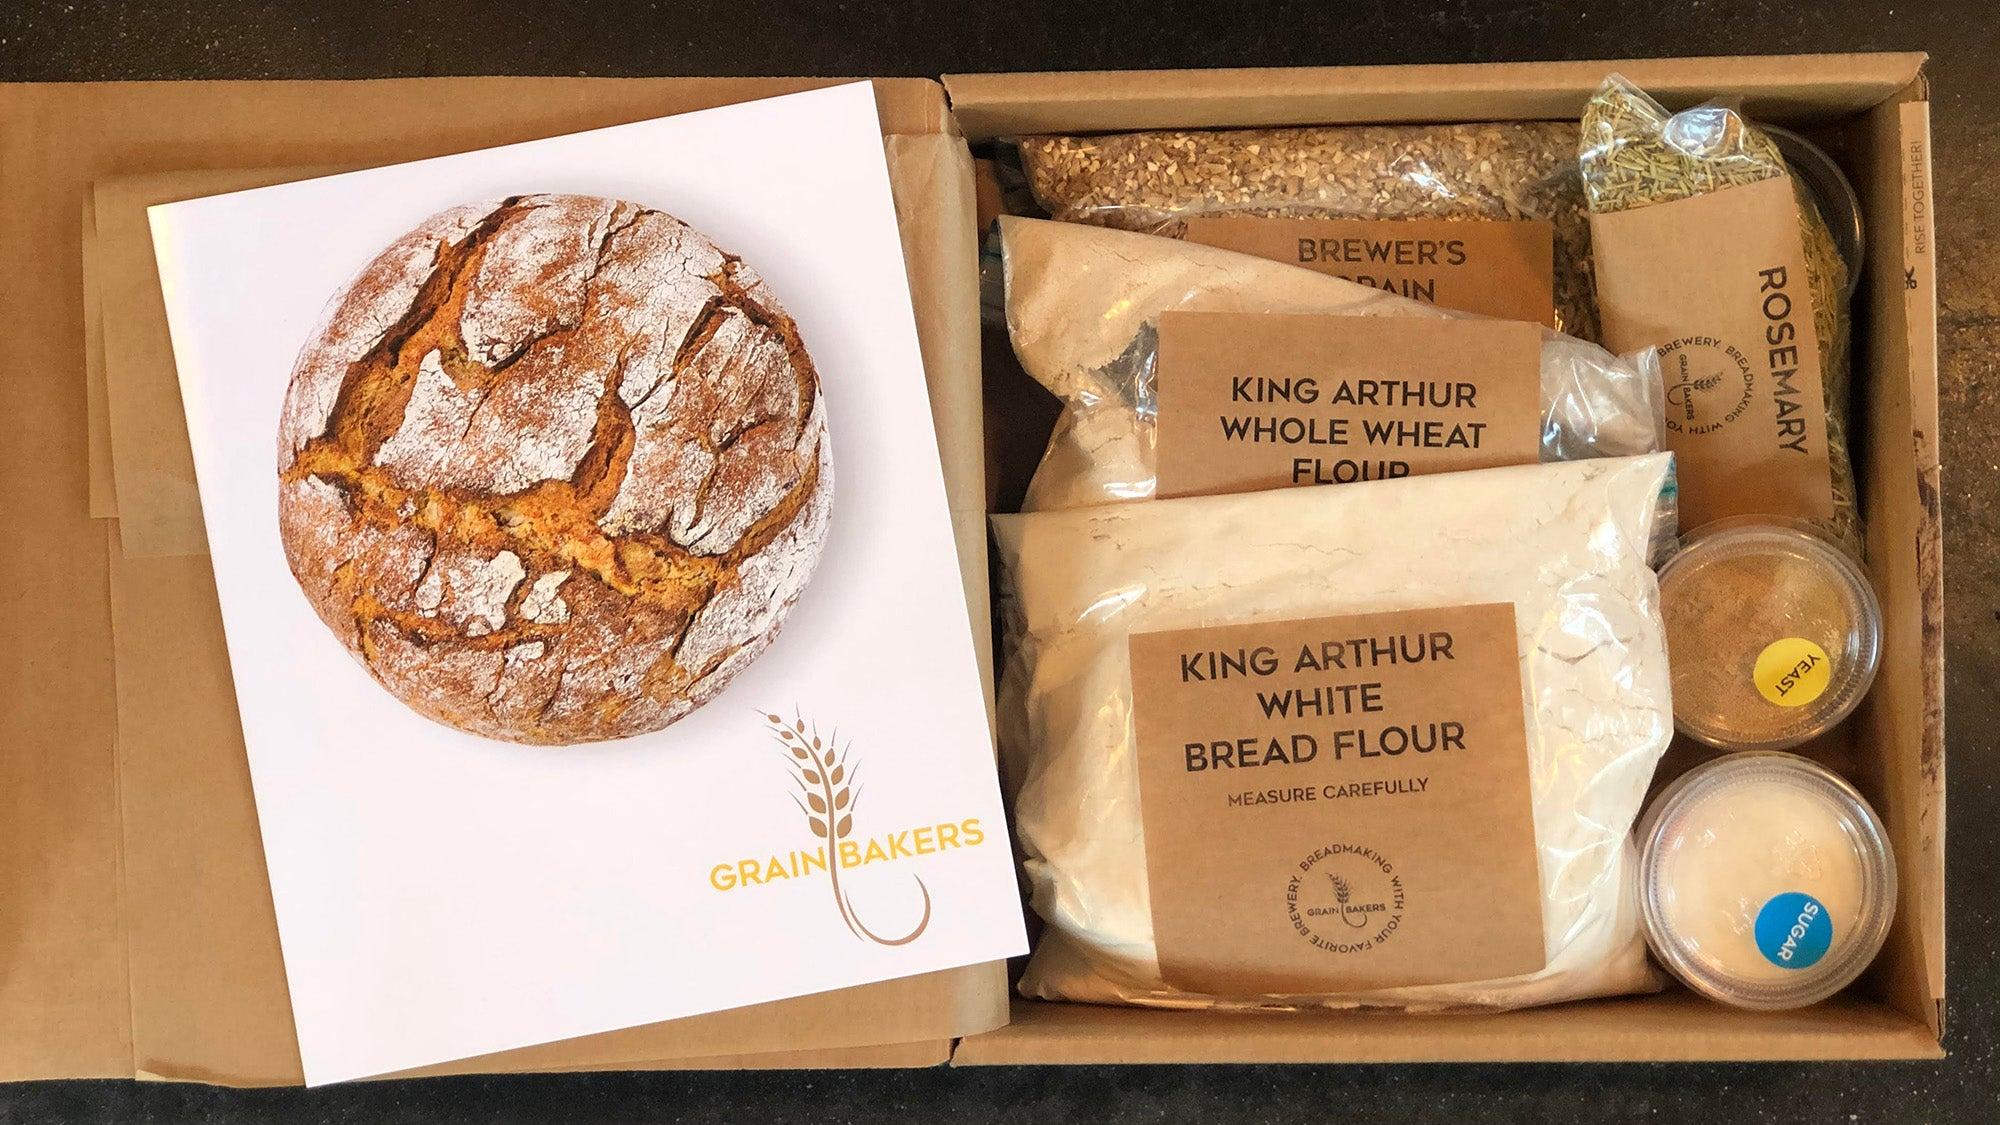 Bread kit from Grainbakers